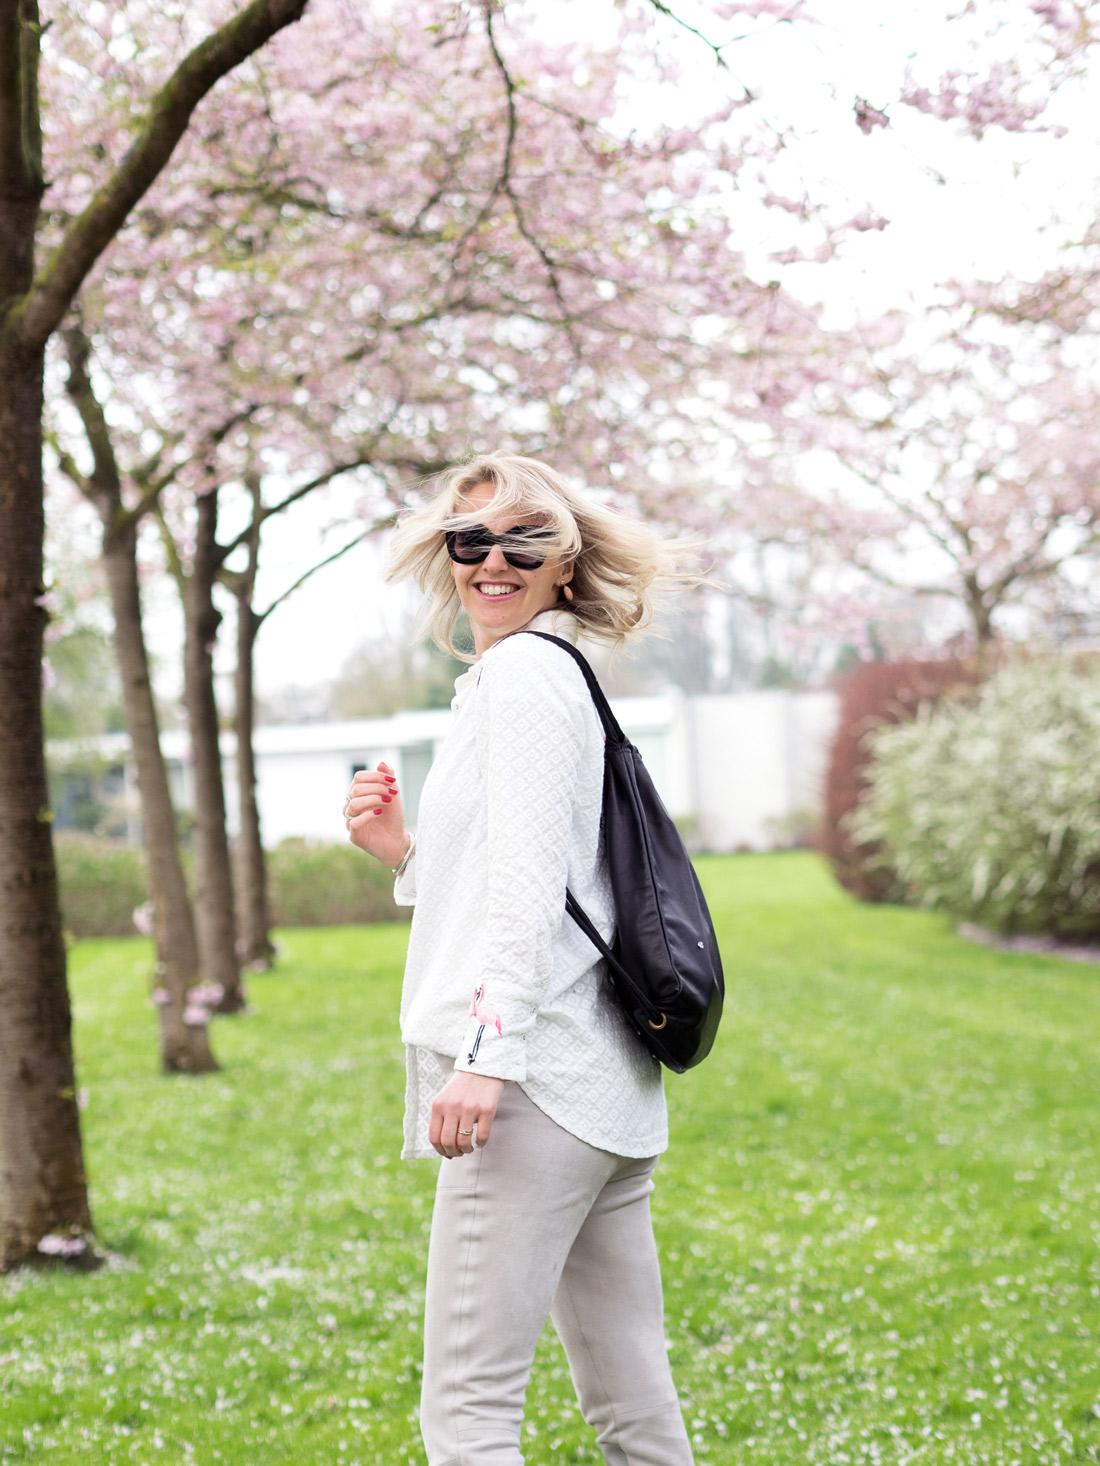 BAGATYOU_Susanne_Bavinck_Bender_Blogger_Fashion_Amsterdam_By_Marinke_Davelaar---Polette-Sunglasses